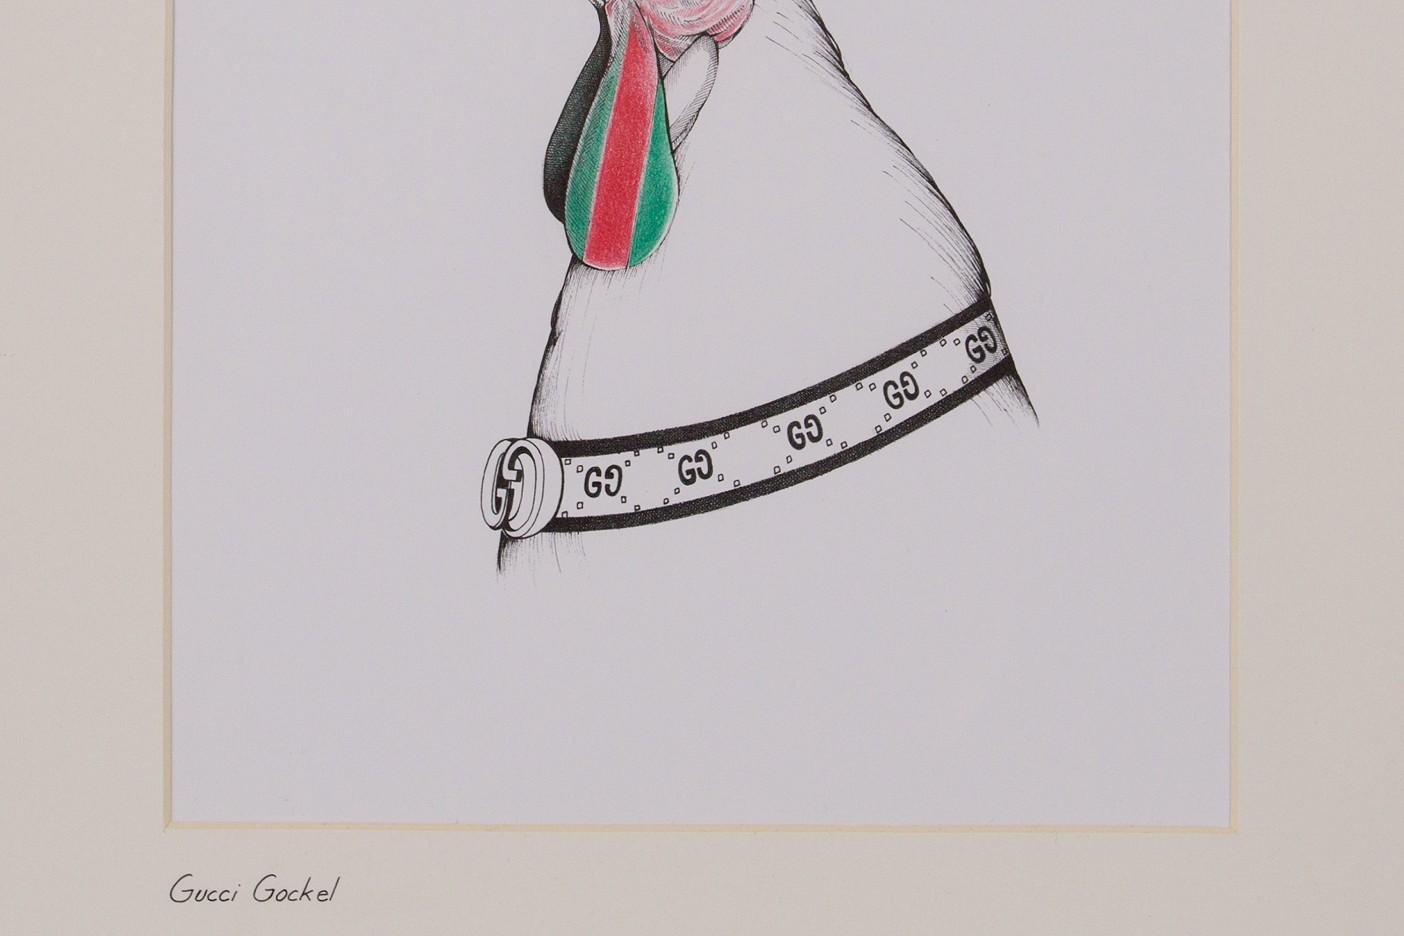 Gucci Gockel